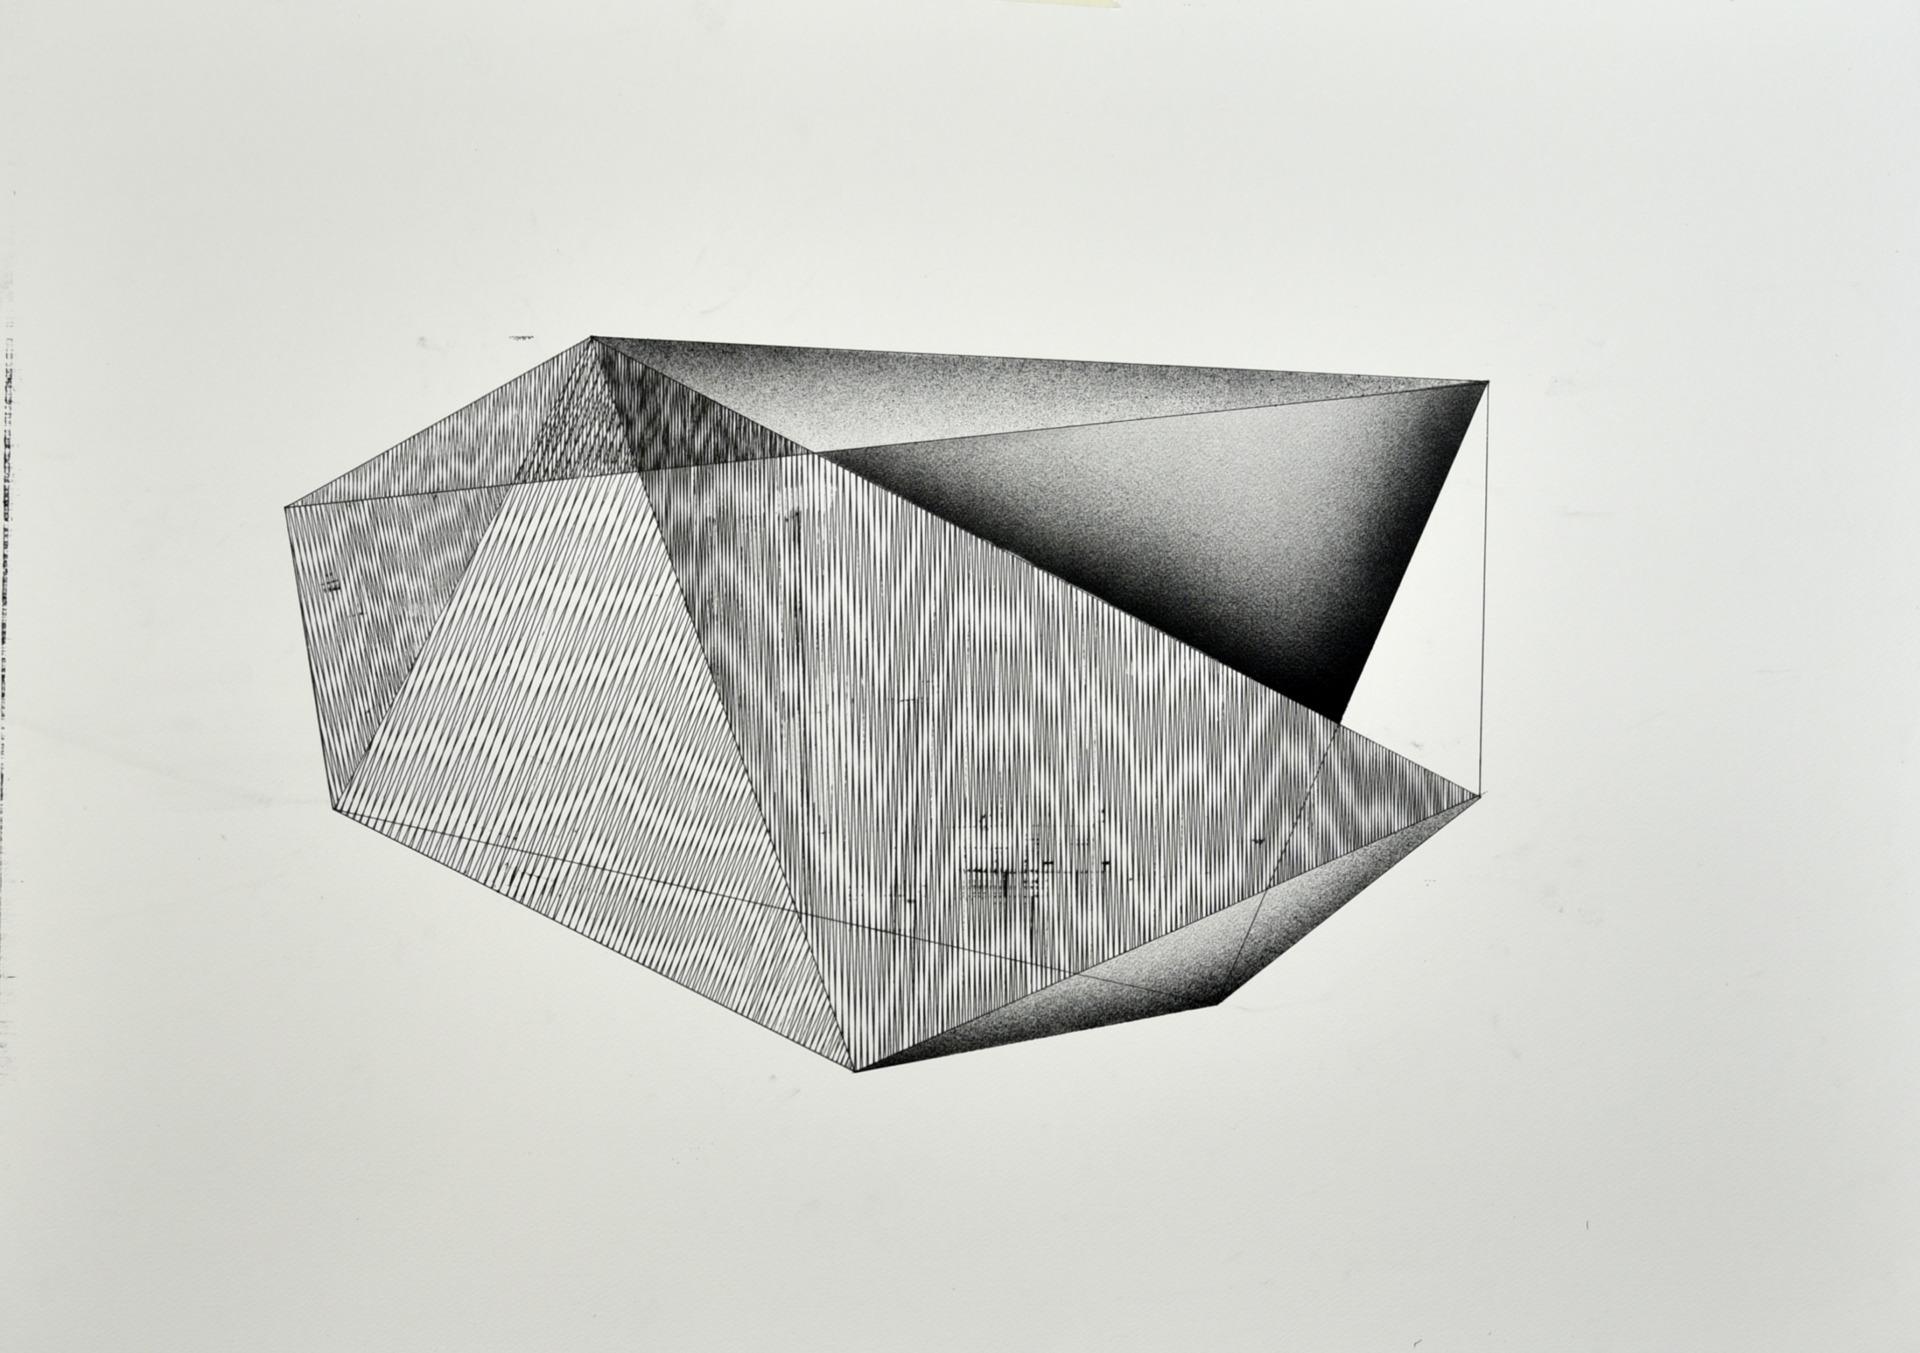 Contemporary art from Gyula Sági | Op.141220. 6